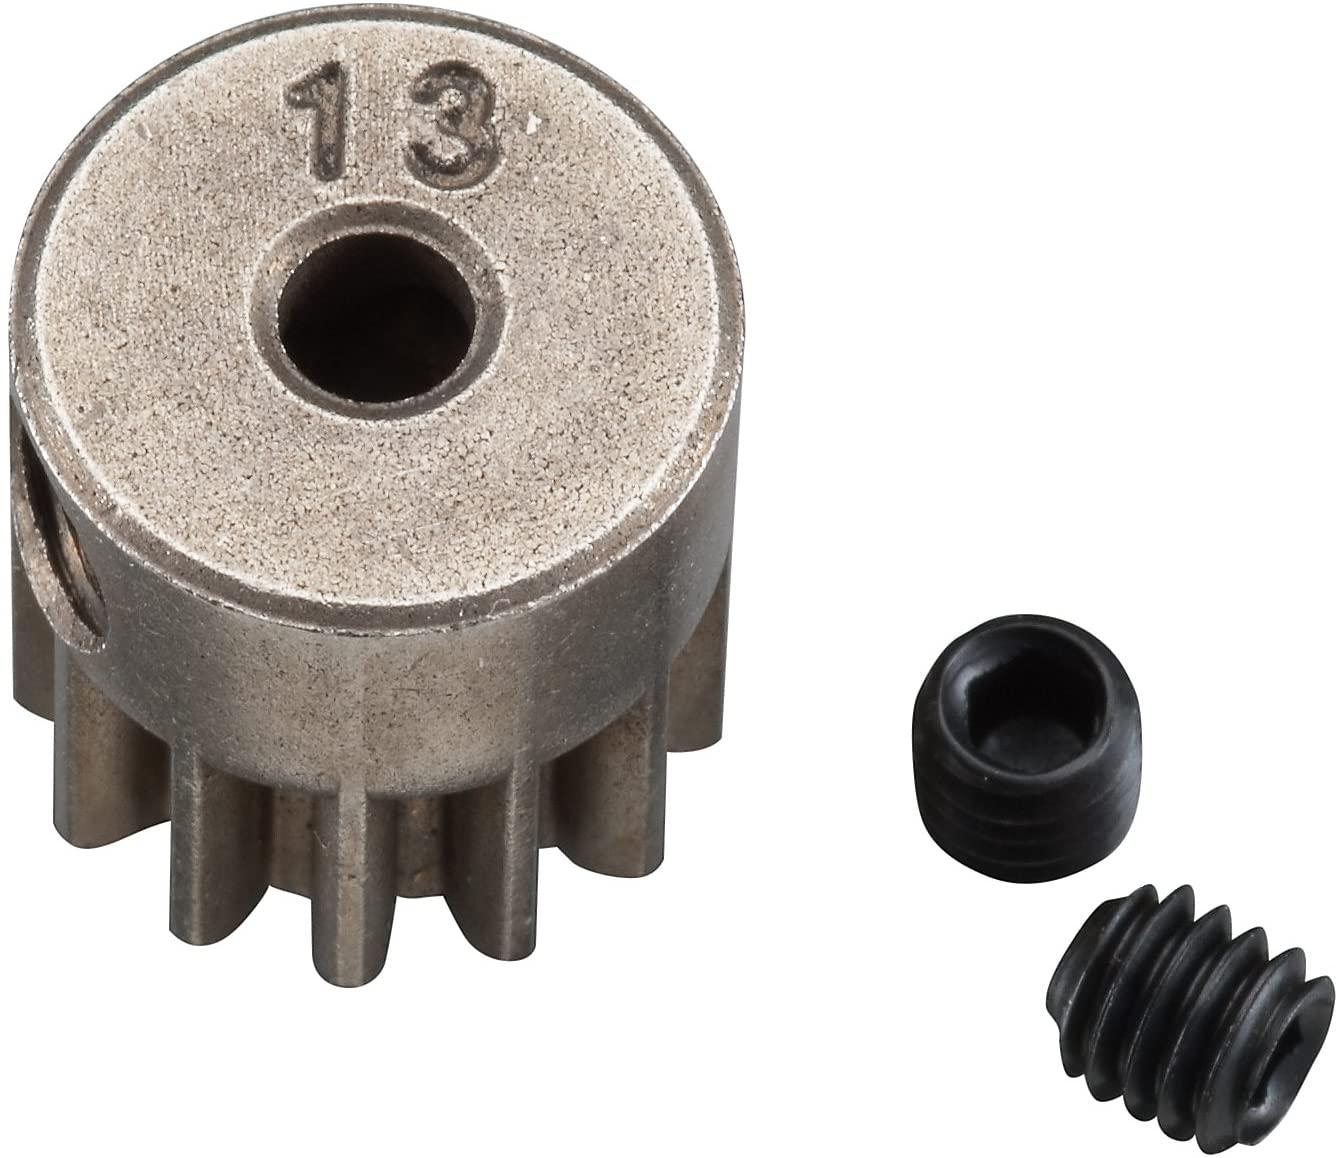 Axial AX30724 32P 13T Pinion Gear, Steel Motor Shaft, 3mm